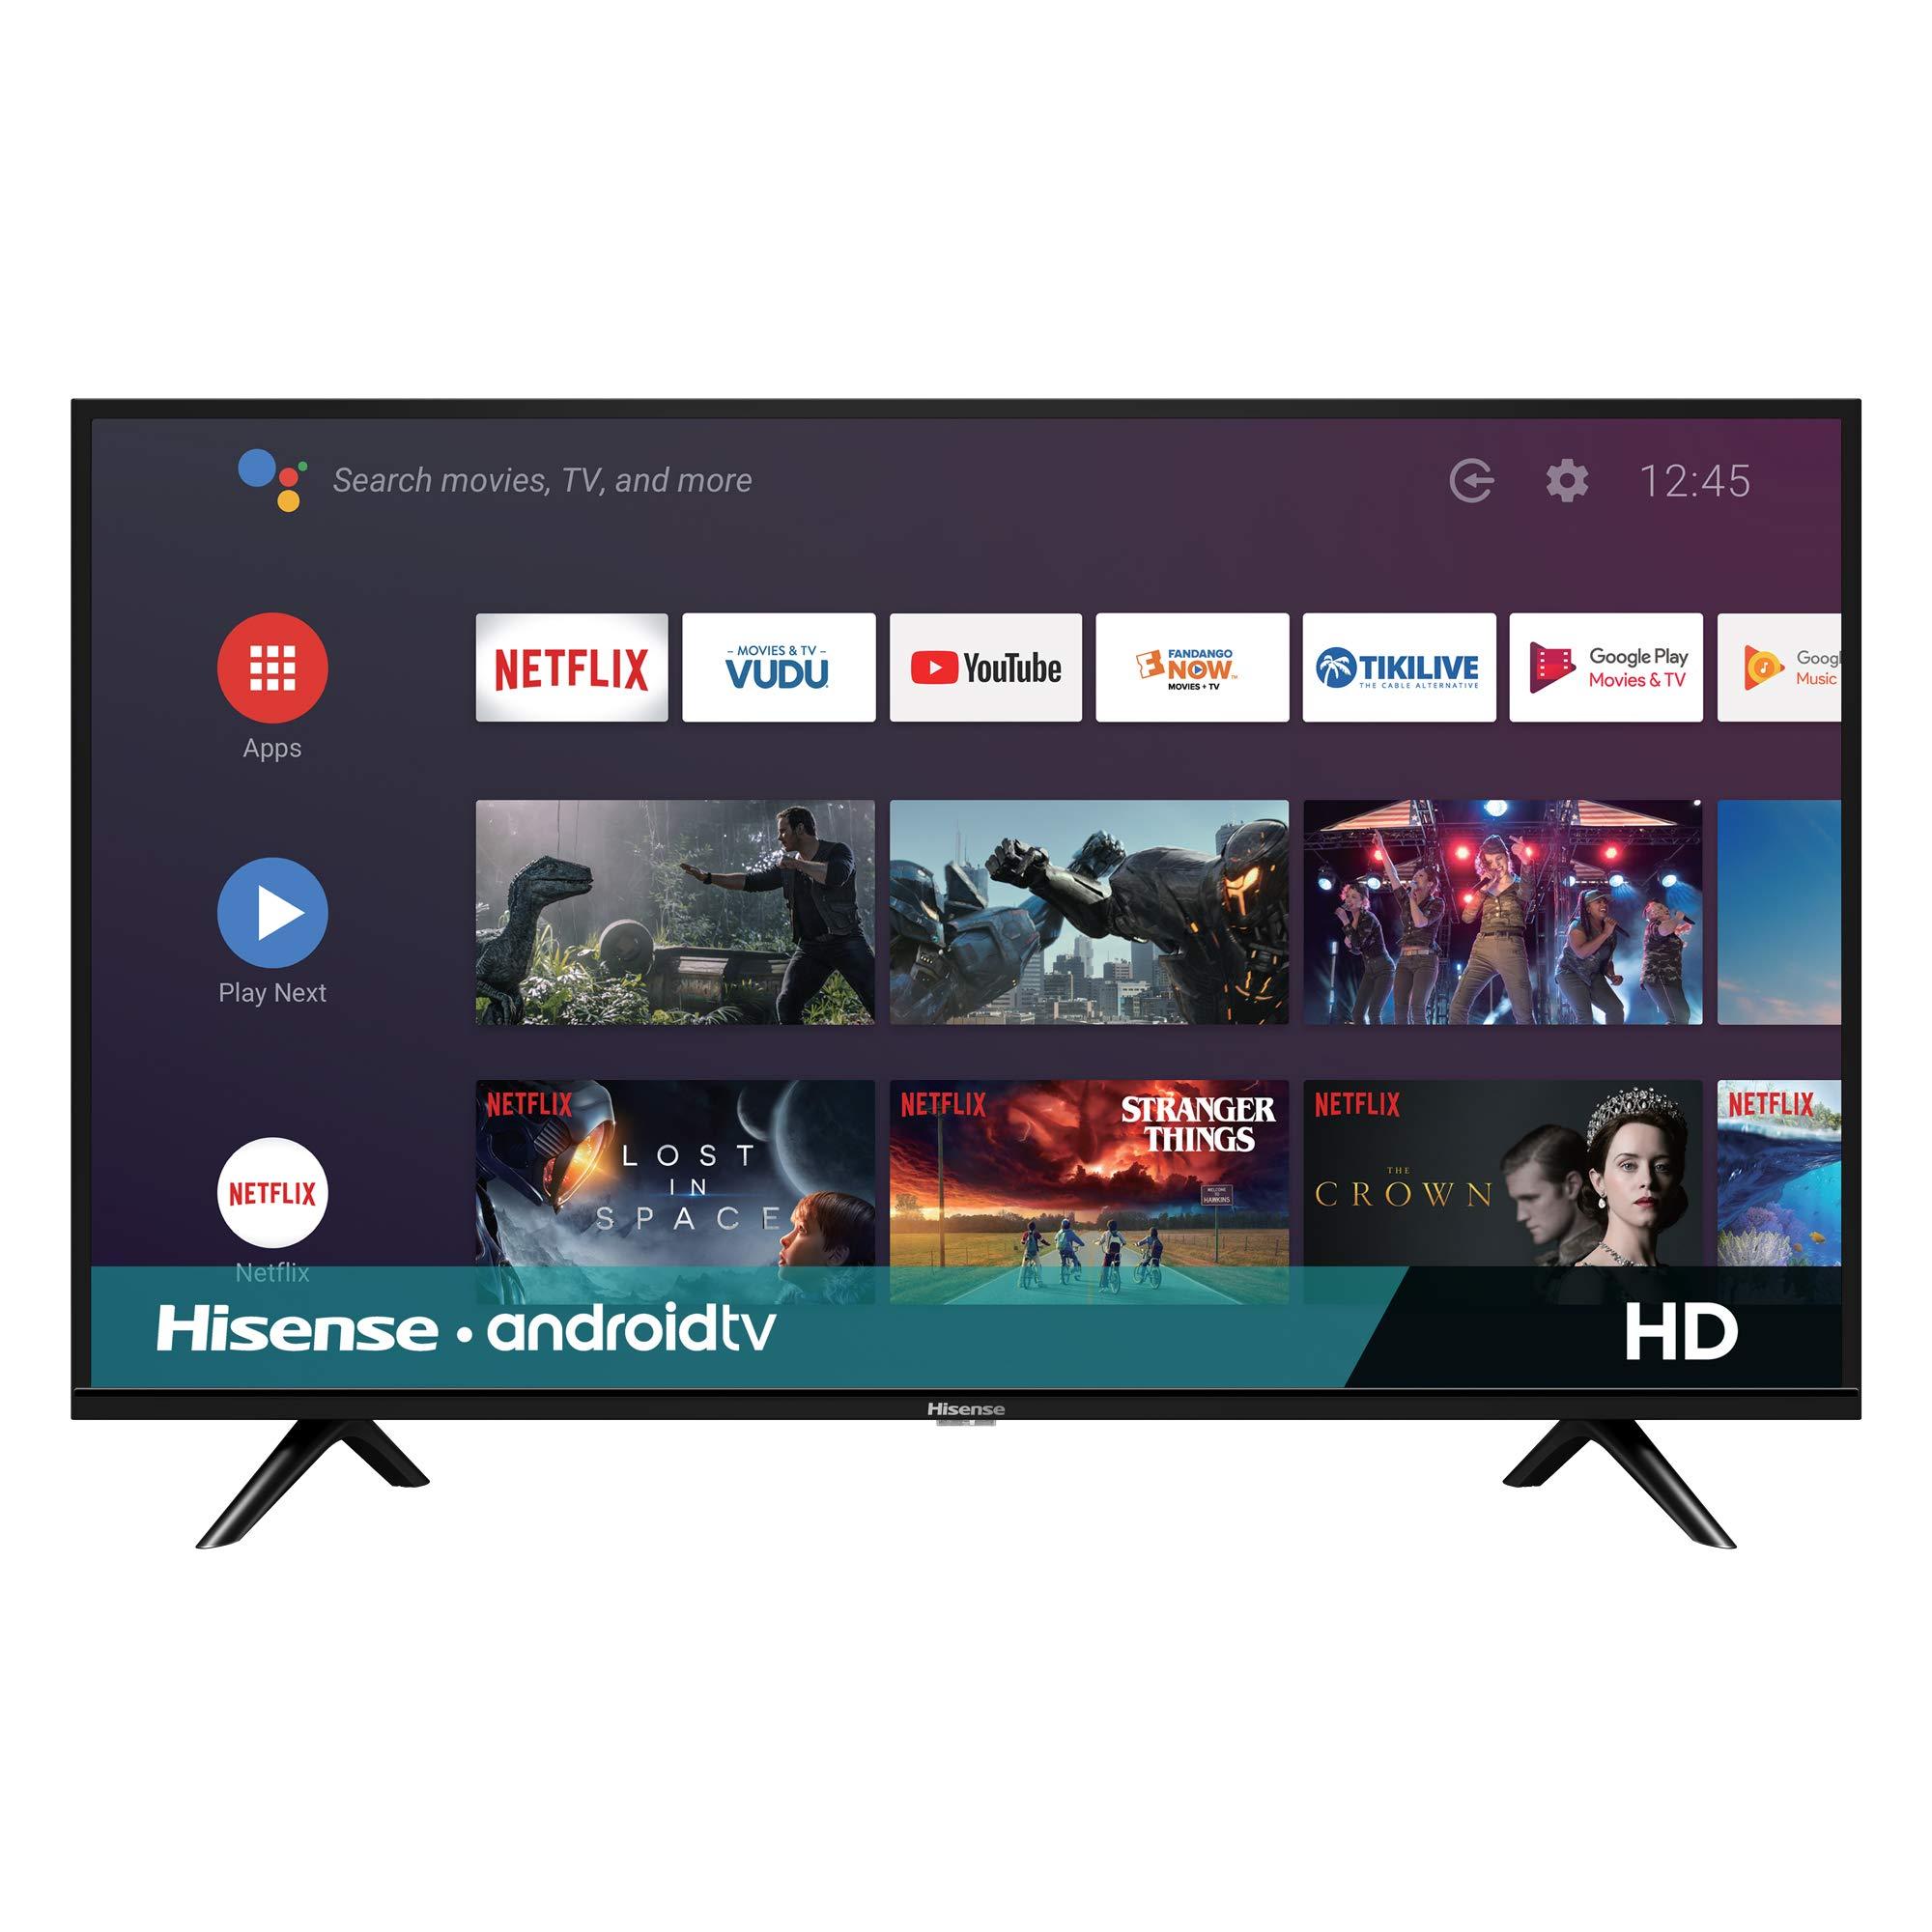 Hisense 32H5590F 32-inch 720p Android Smart LED TV (2019)